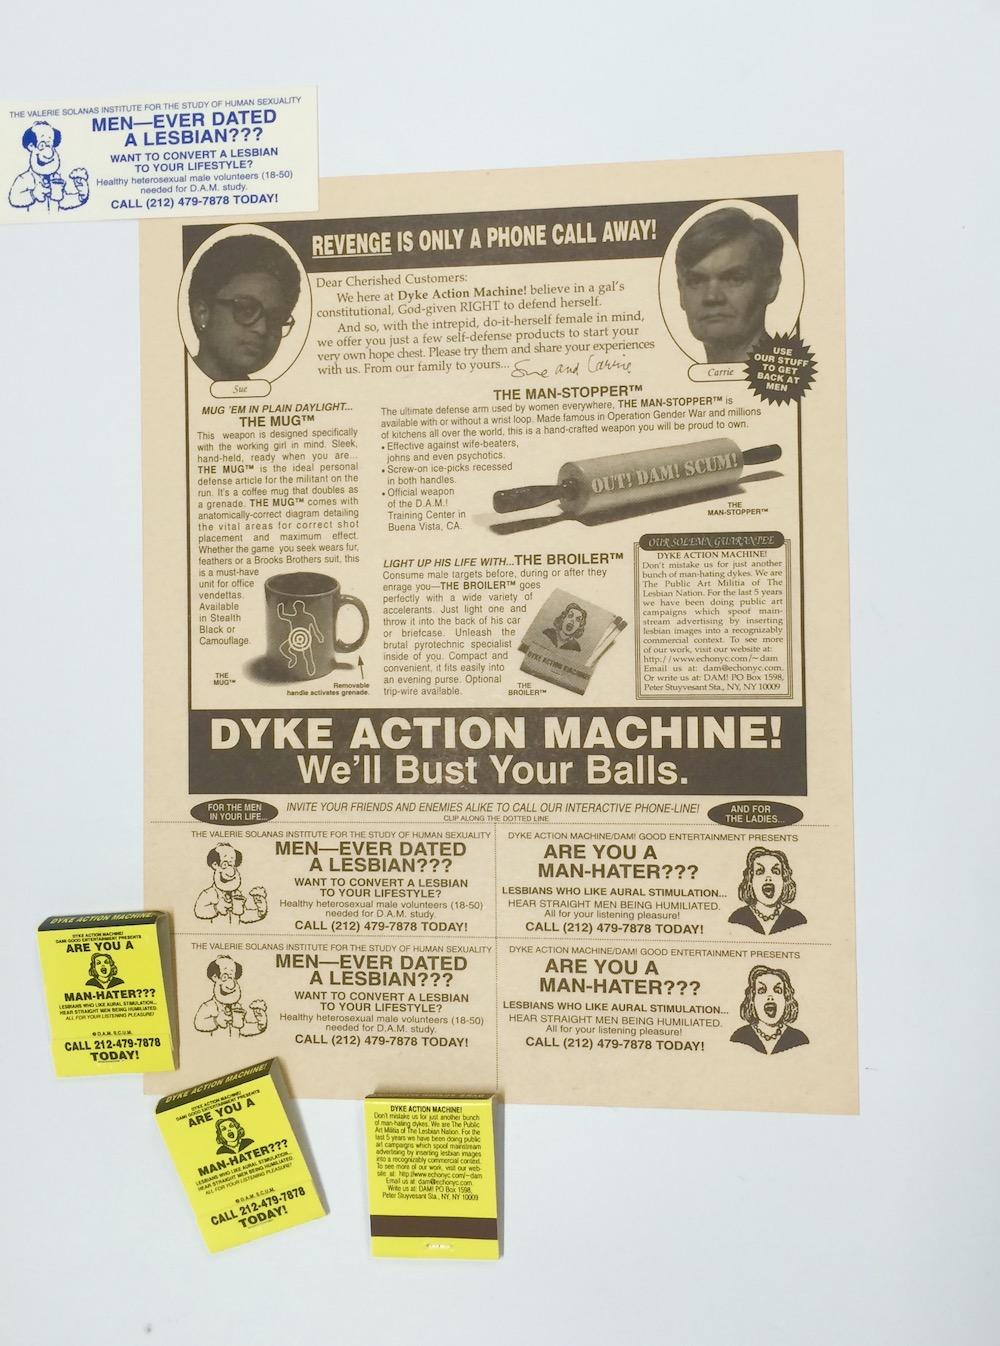 Dyke Action Machine, DAM SCUM, 1996. Courtesy of Dyke Action Machine! (Carrie Moyer and Sue Schaffner)